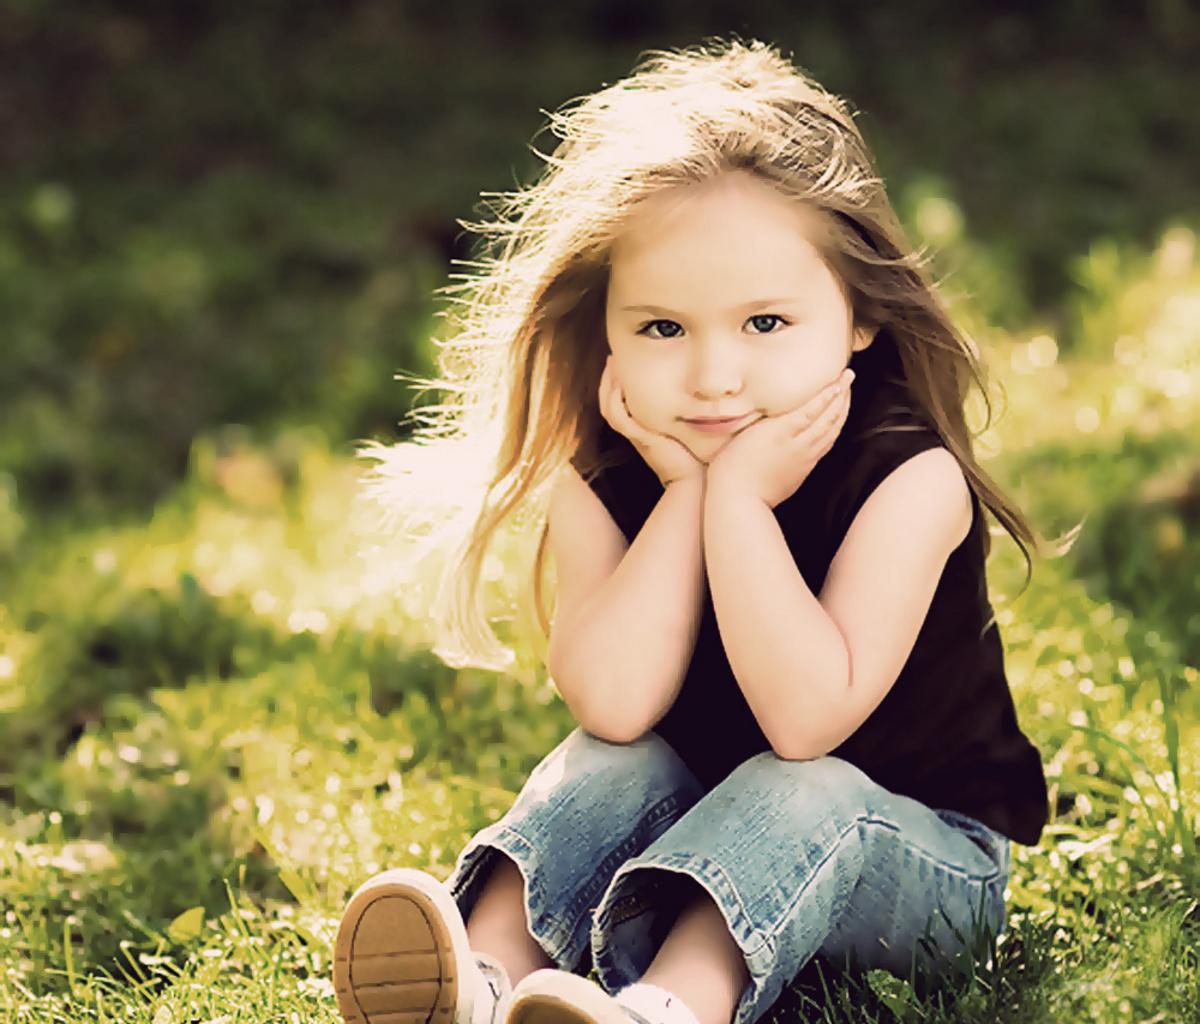 Hd wallpaper cute girl - Funmozar Cute Baby Girl Wallpapers